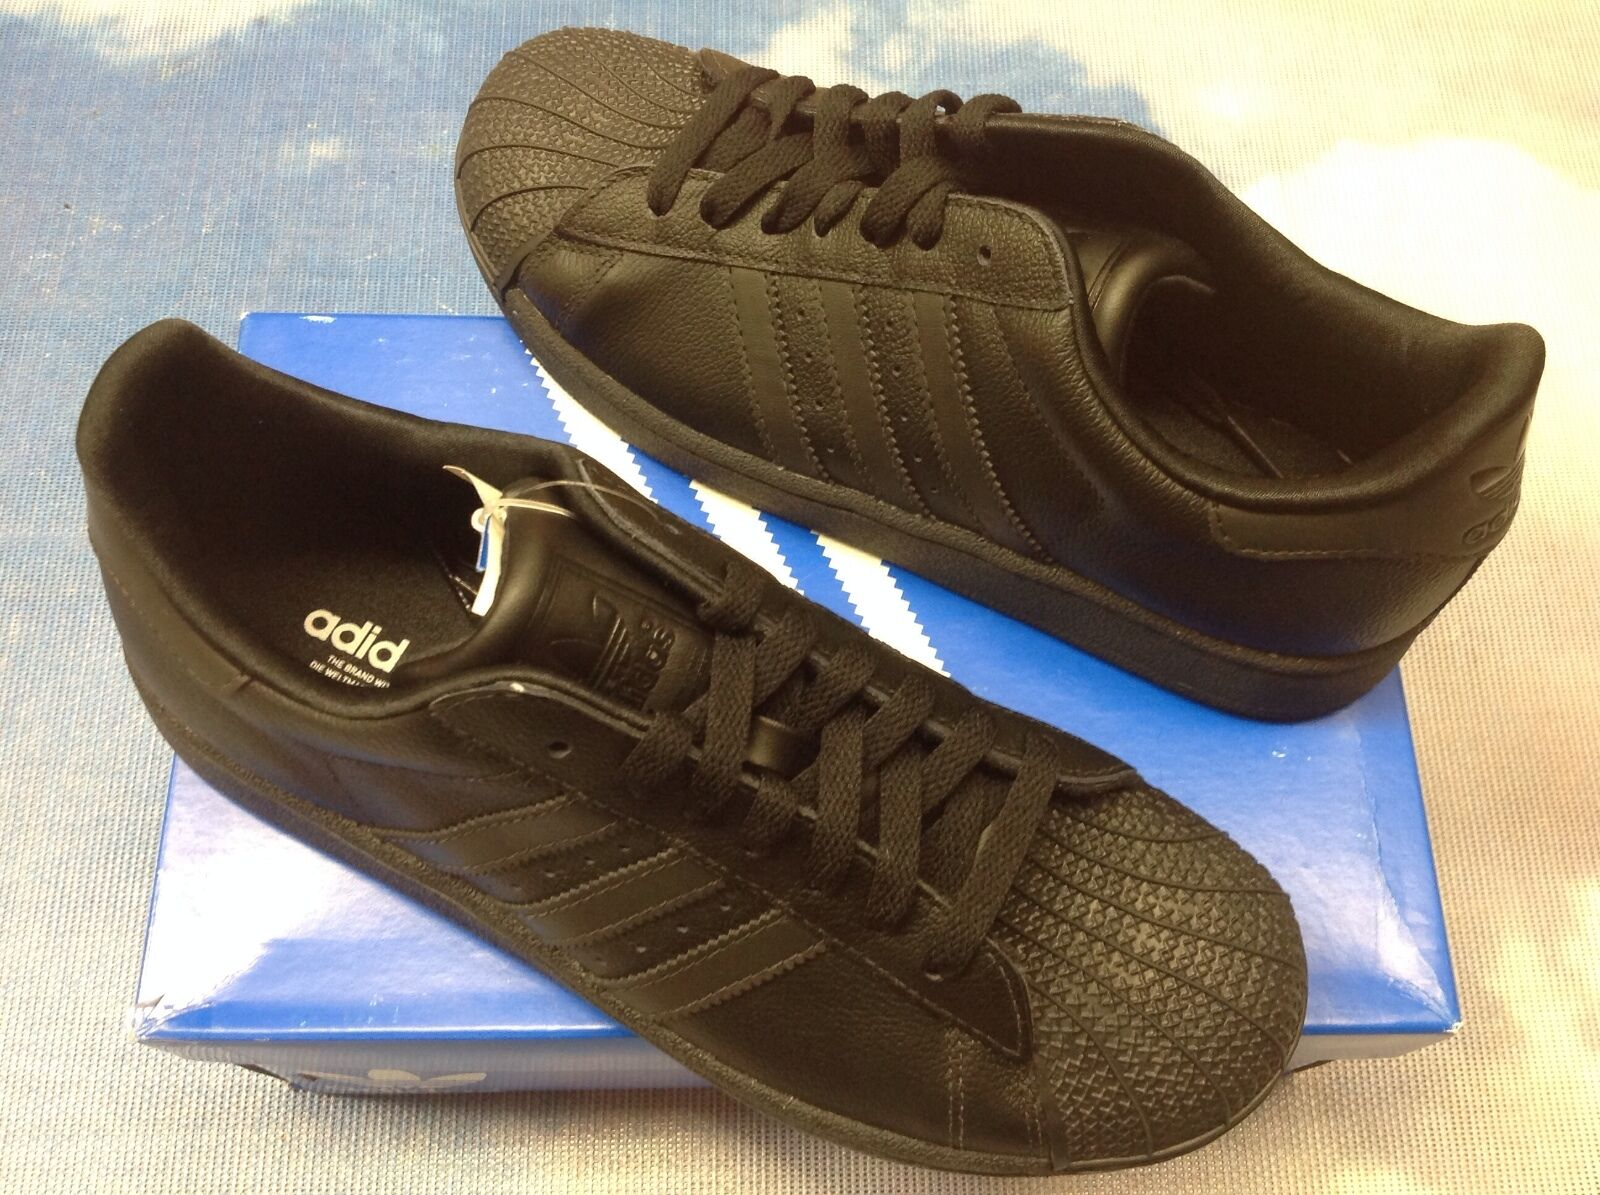 Adidas superstar in uniforme scolastica scarpa giovent dimensioni da donne 4 a 7 / donne da 8,5 80a6f3